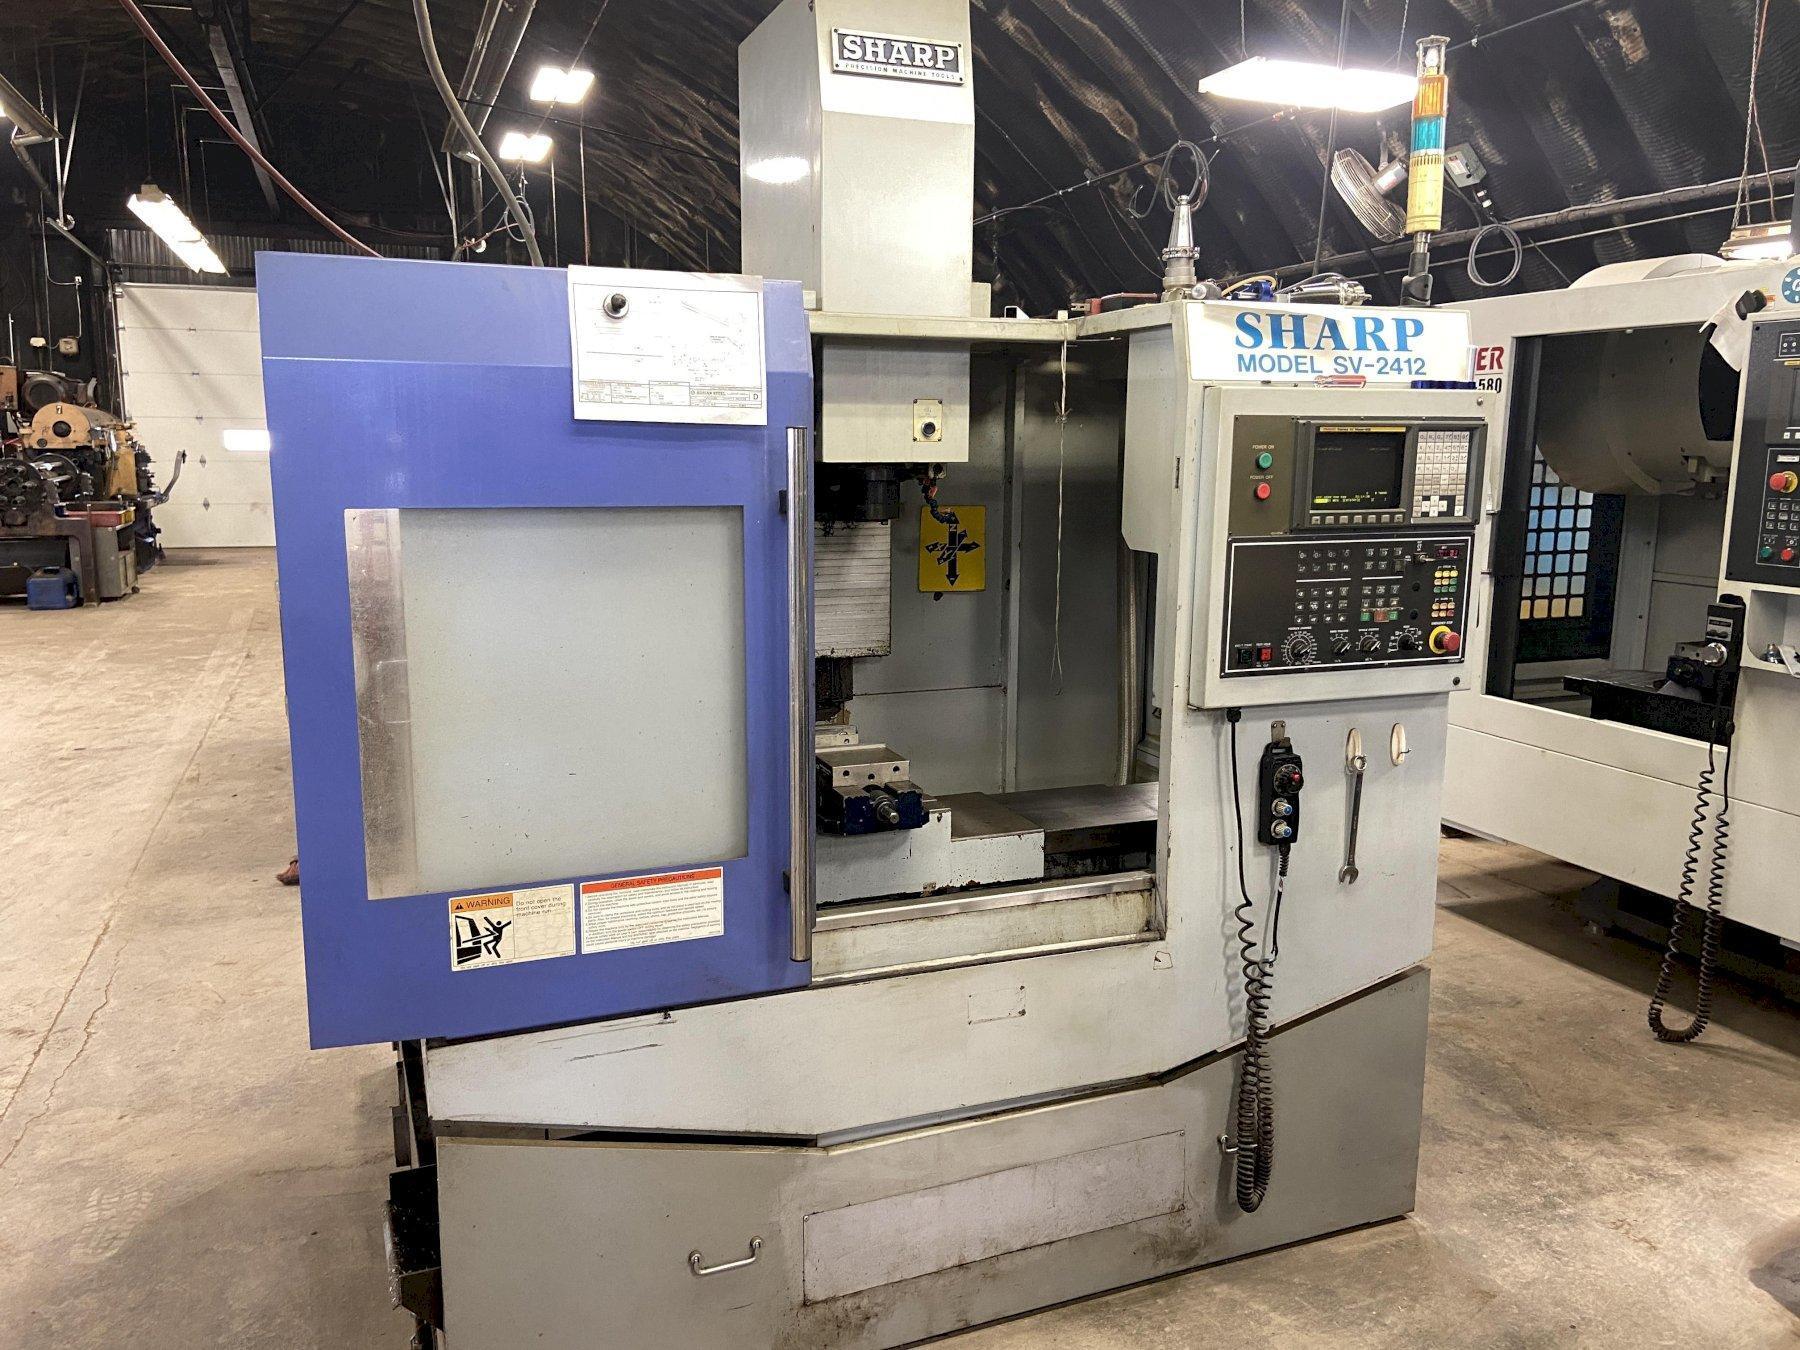 Sharp SV-2412 CNC Vertical Machining Center, new 2006